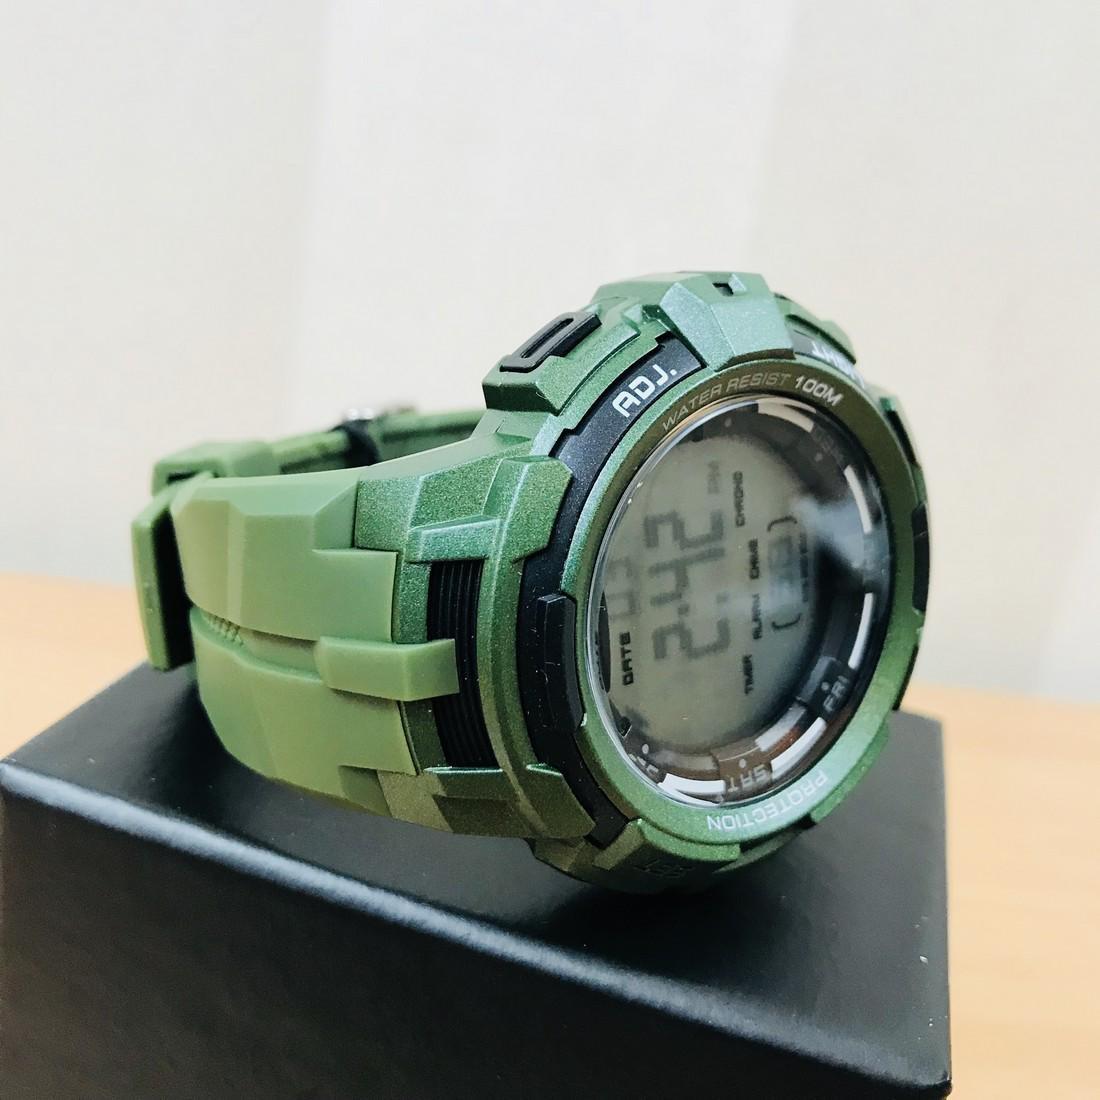 HEAD Super G Green Multifunctional Watch - 5